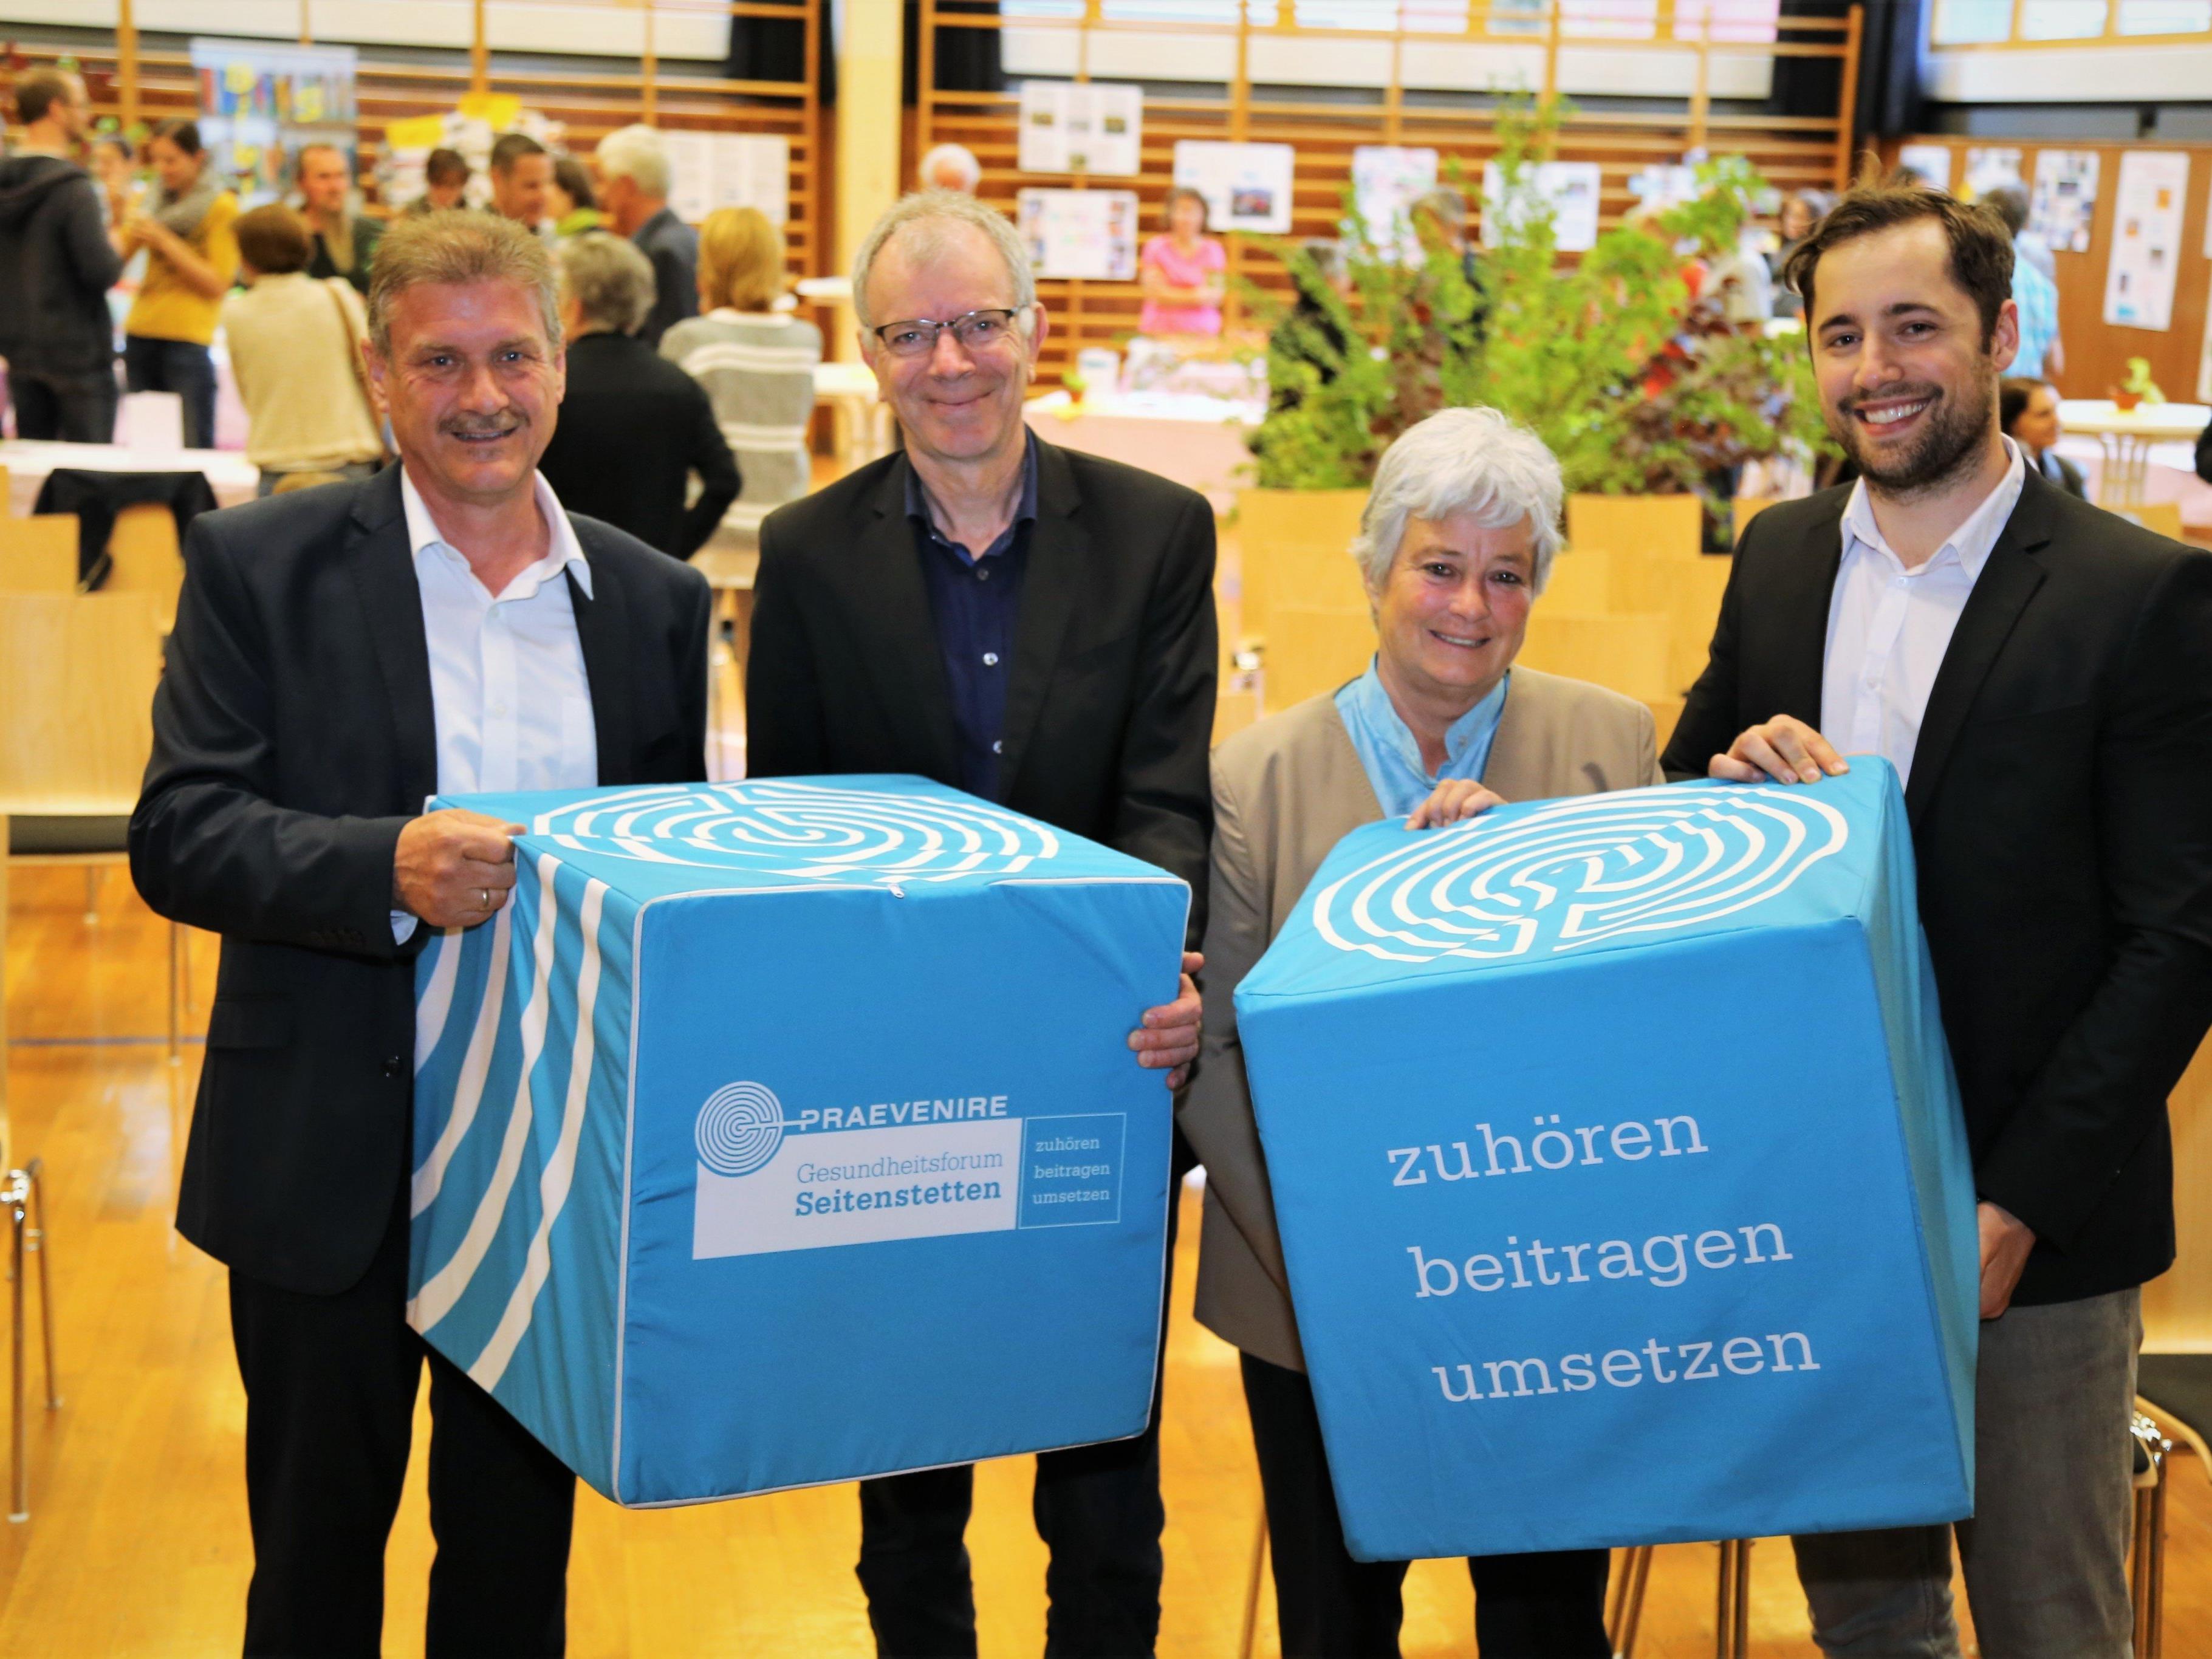 Bürgermeister Anton Metzler, Dr. Karl Lhotta, Vizebürgermeisterin Doris Amann und Projektvertreter Fabian Frühstück.